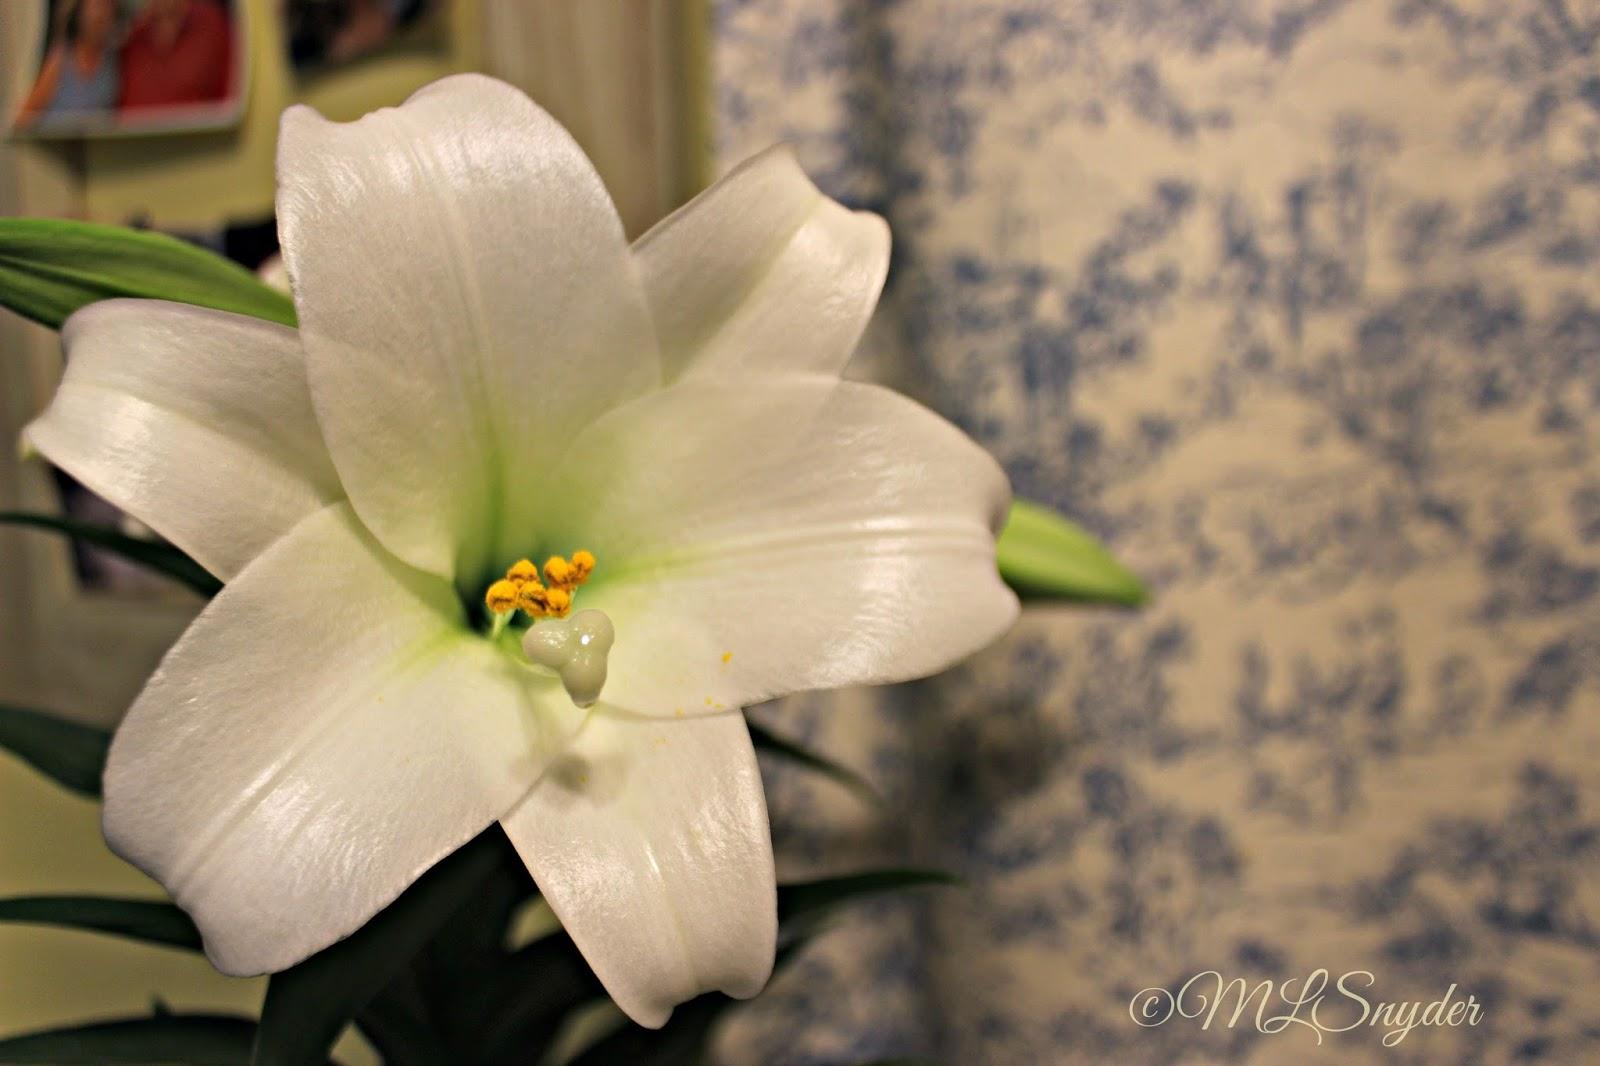 Image of lily flower in flower anatomy gardening flower and grandparents grandchildren anatomy of a lily flower izmirmasajfo